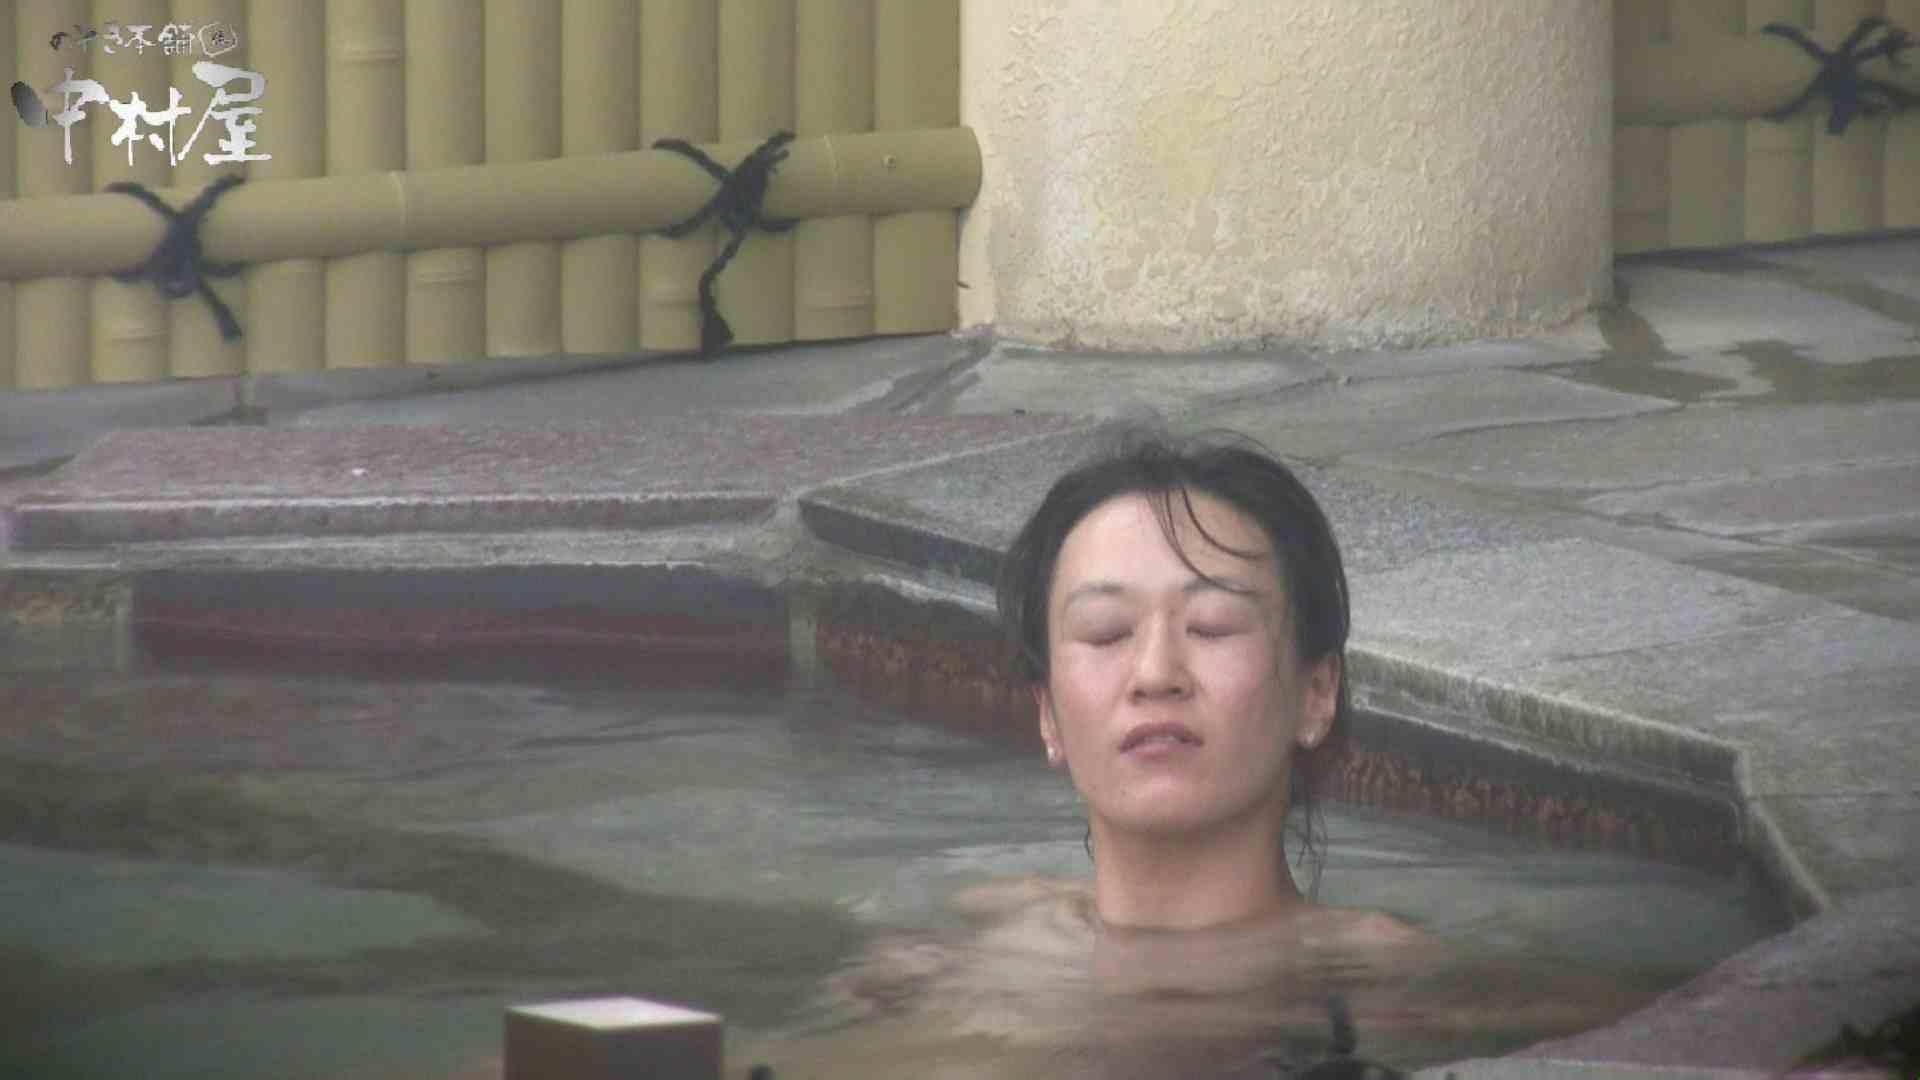 Aquaな露天風呂Vol.928 OLセックス  99画像 24